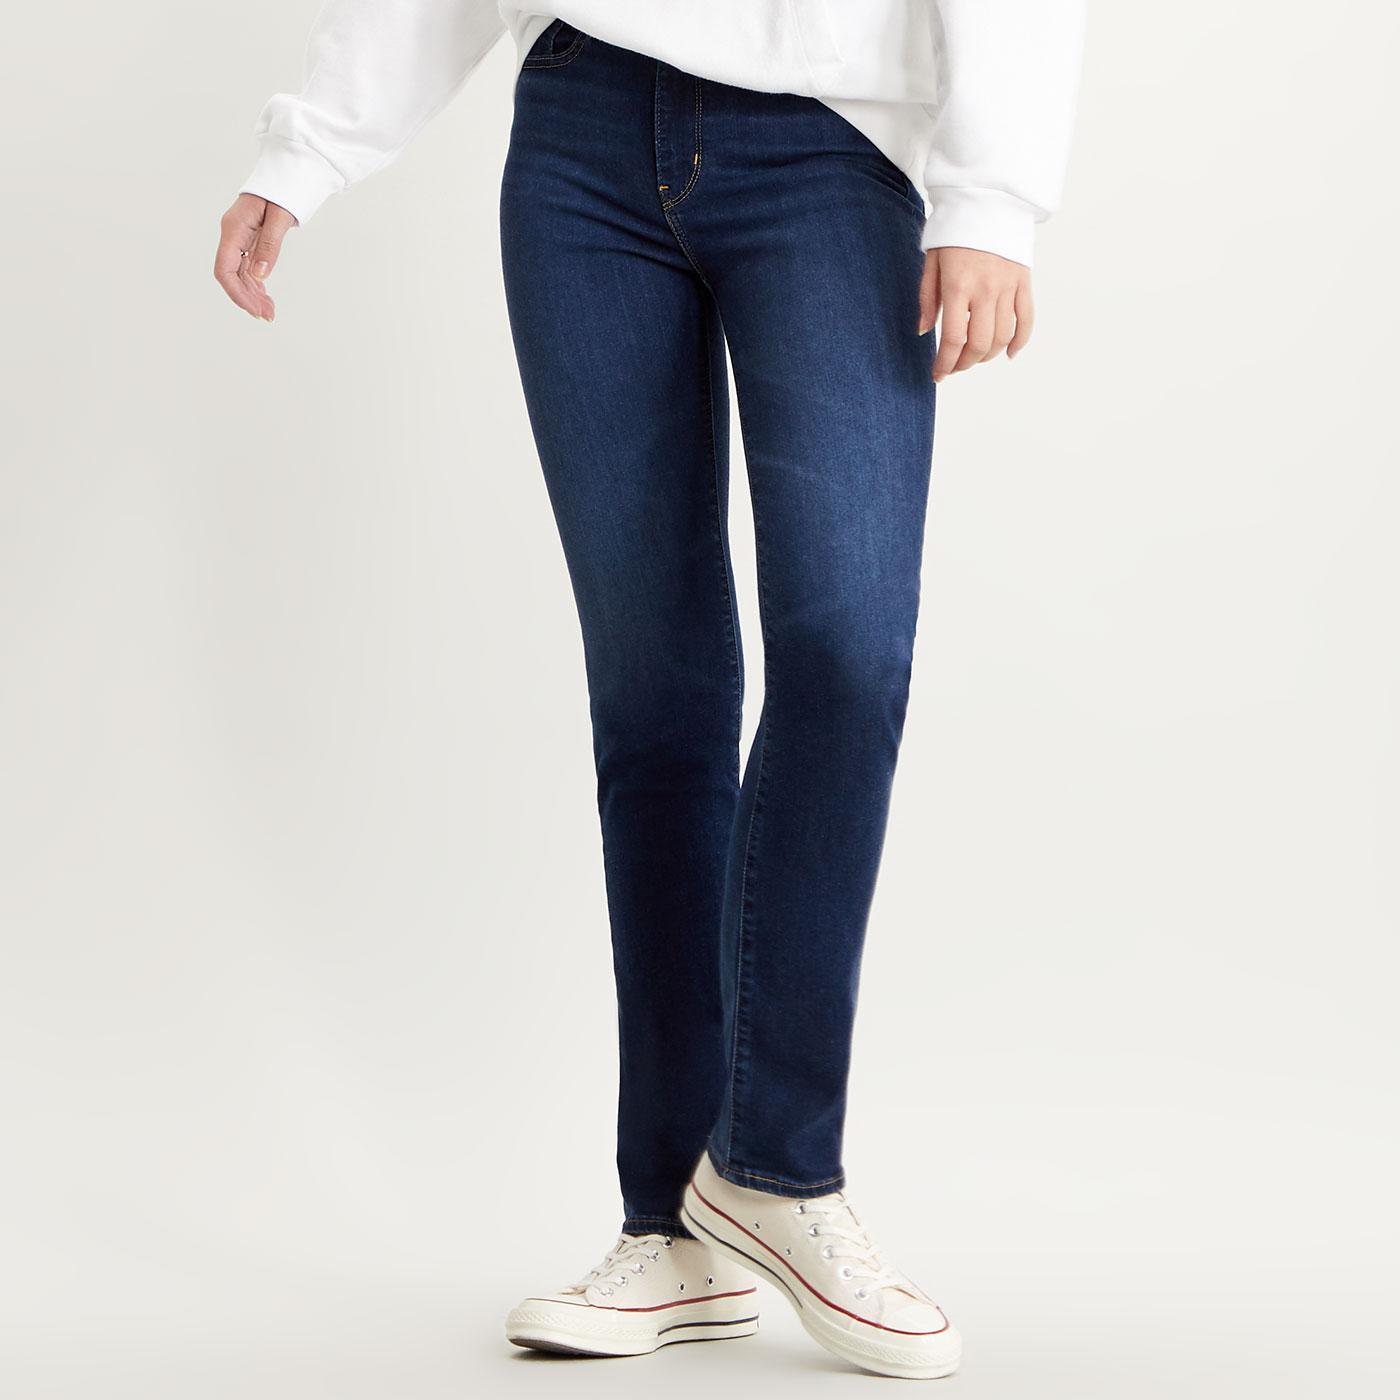 LEVI'S 724 High Rise Straight Jeans - Bogota Calm